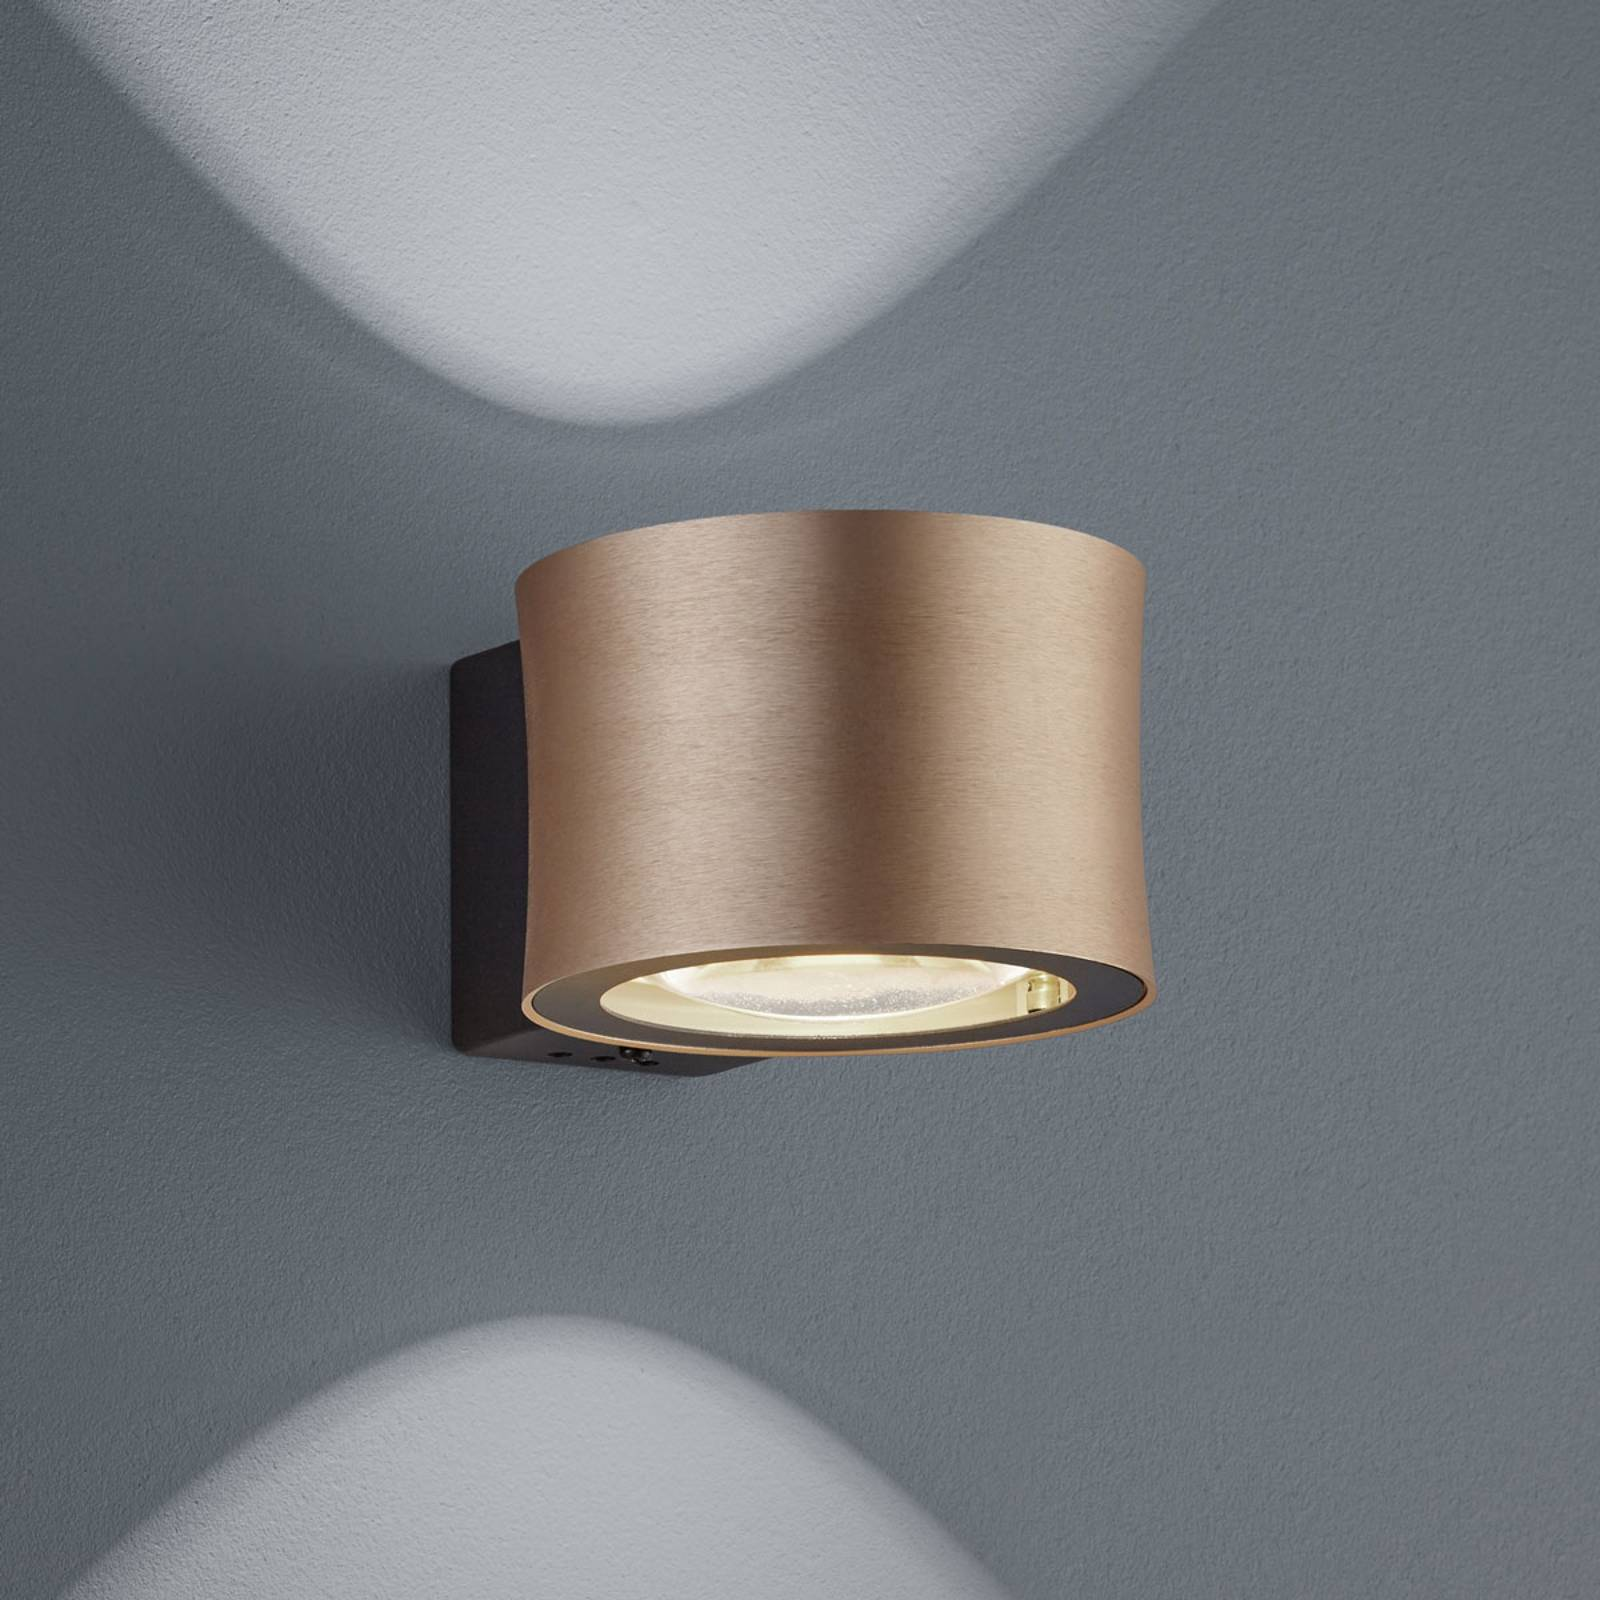 BANKAMP Impulse LED wandlamp